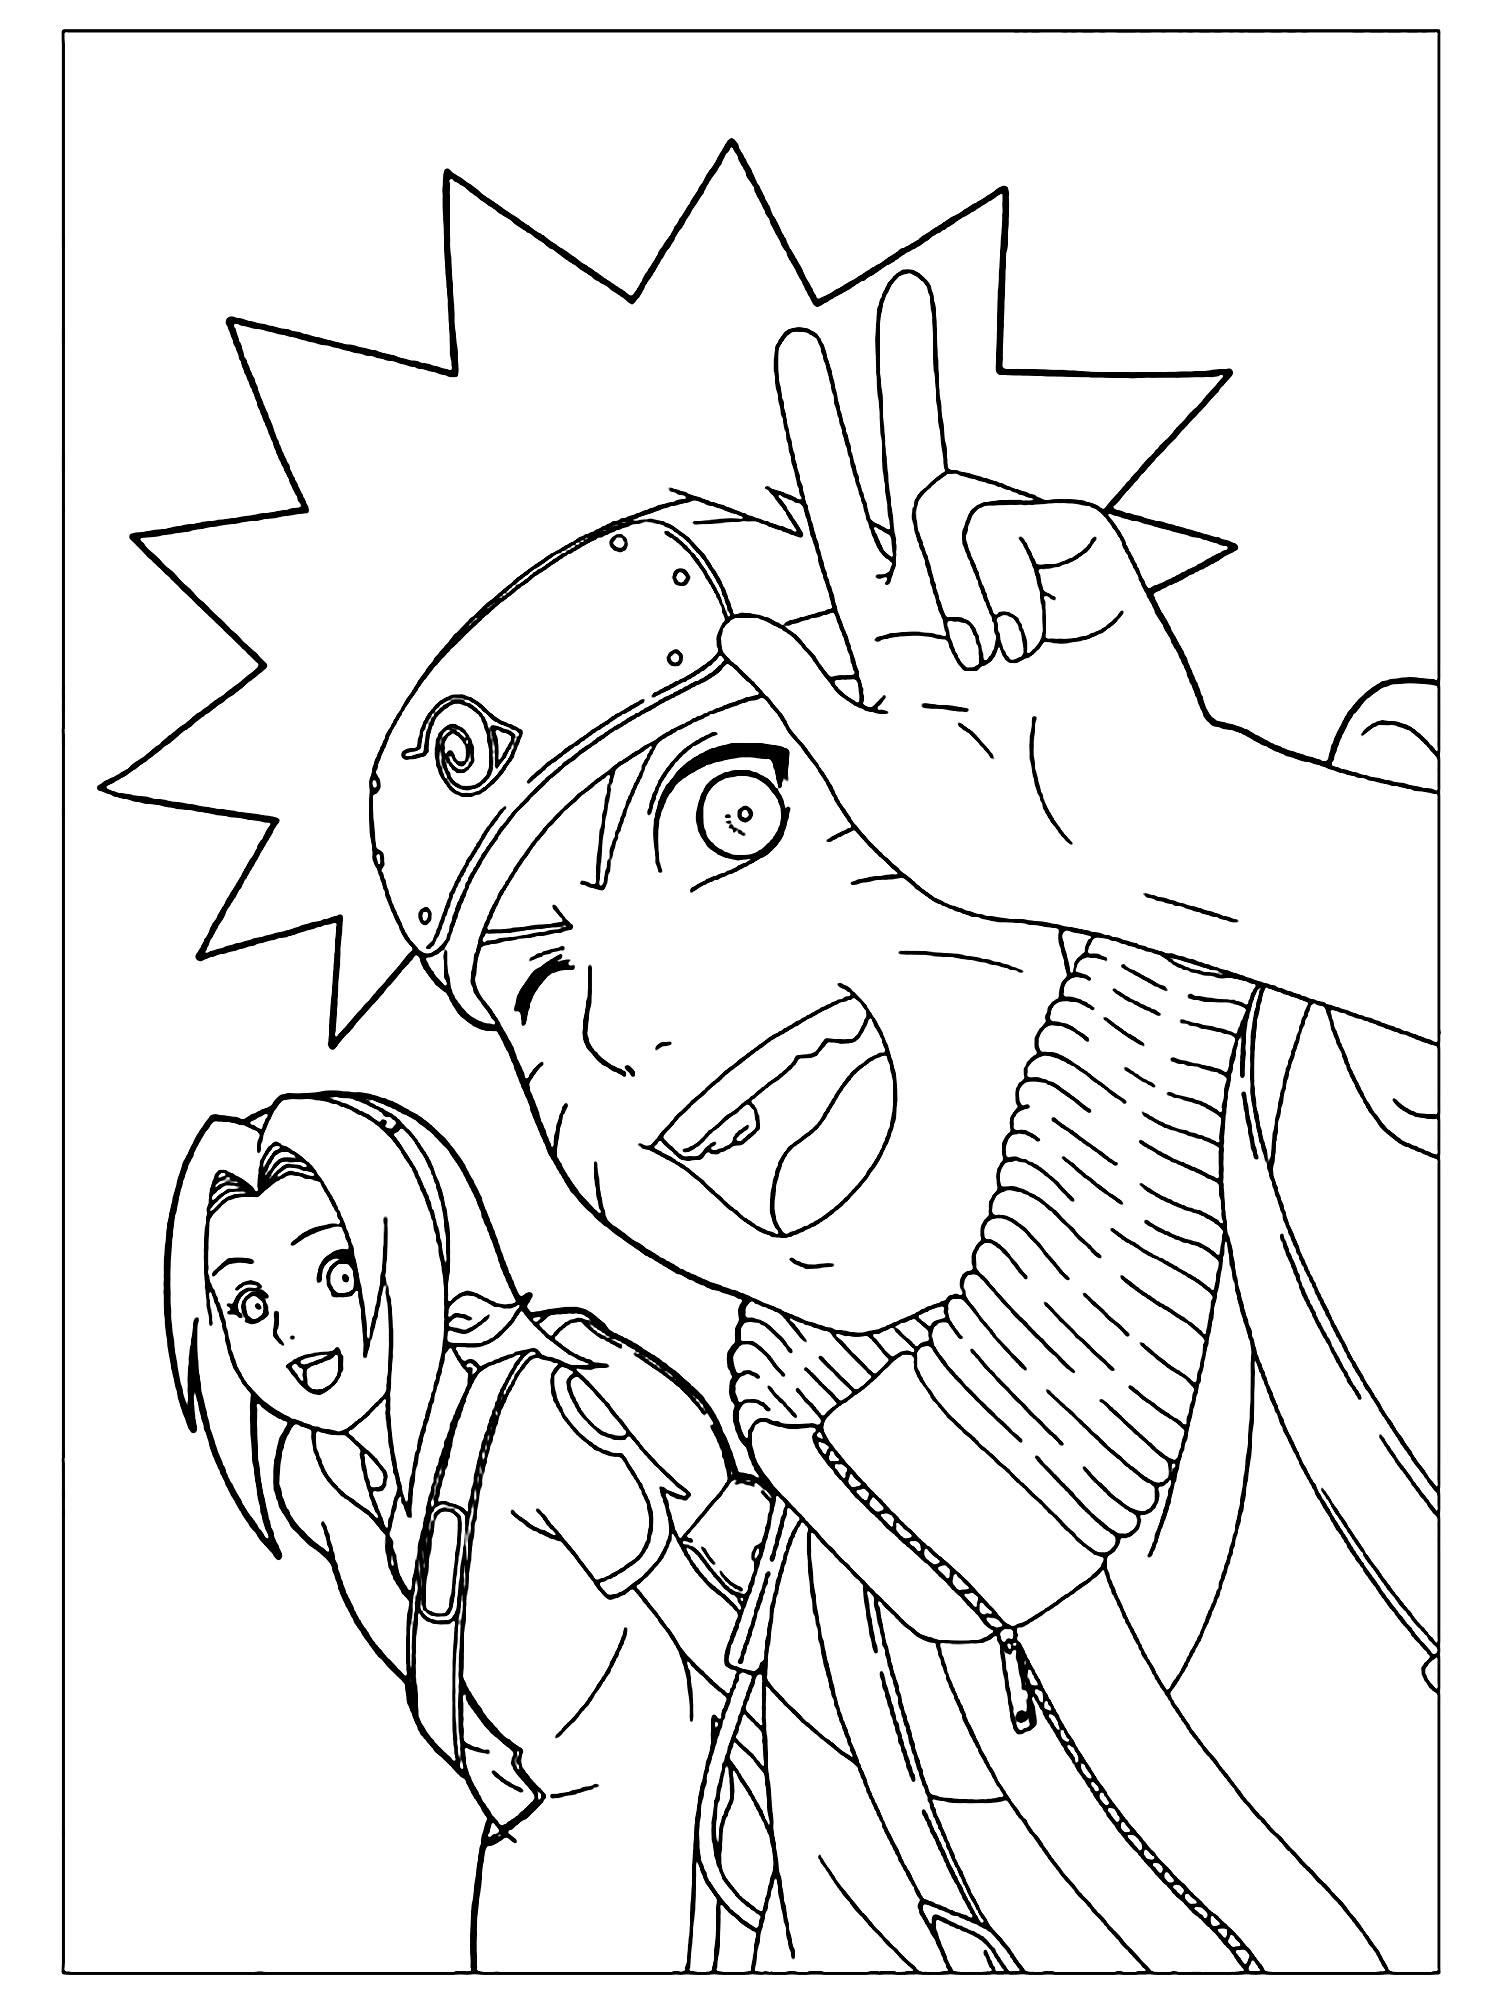 Naruto Et Sakura - Coloriage Naruto - Coloriages Pour Enfants concernant Dessin Naruto